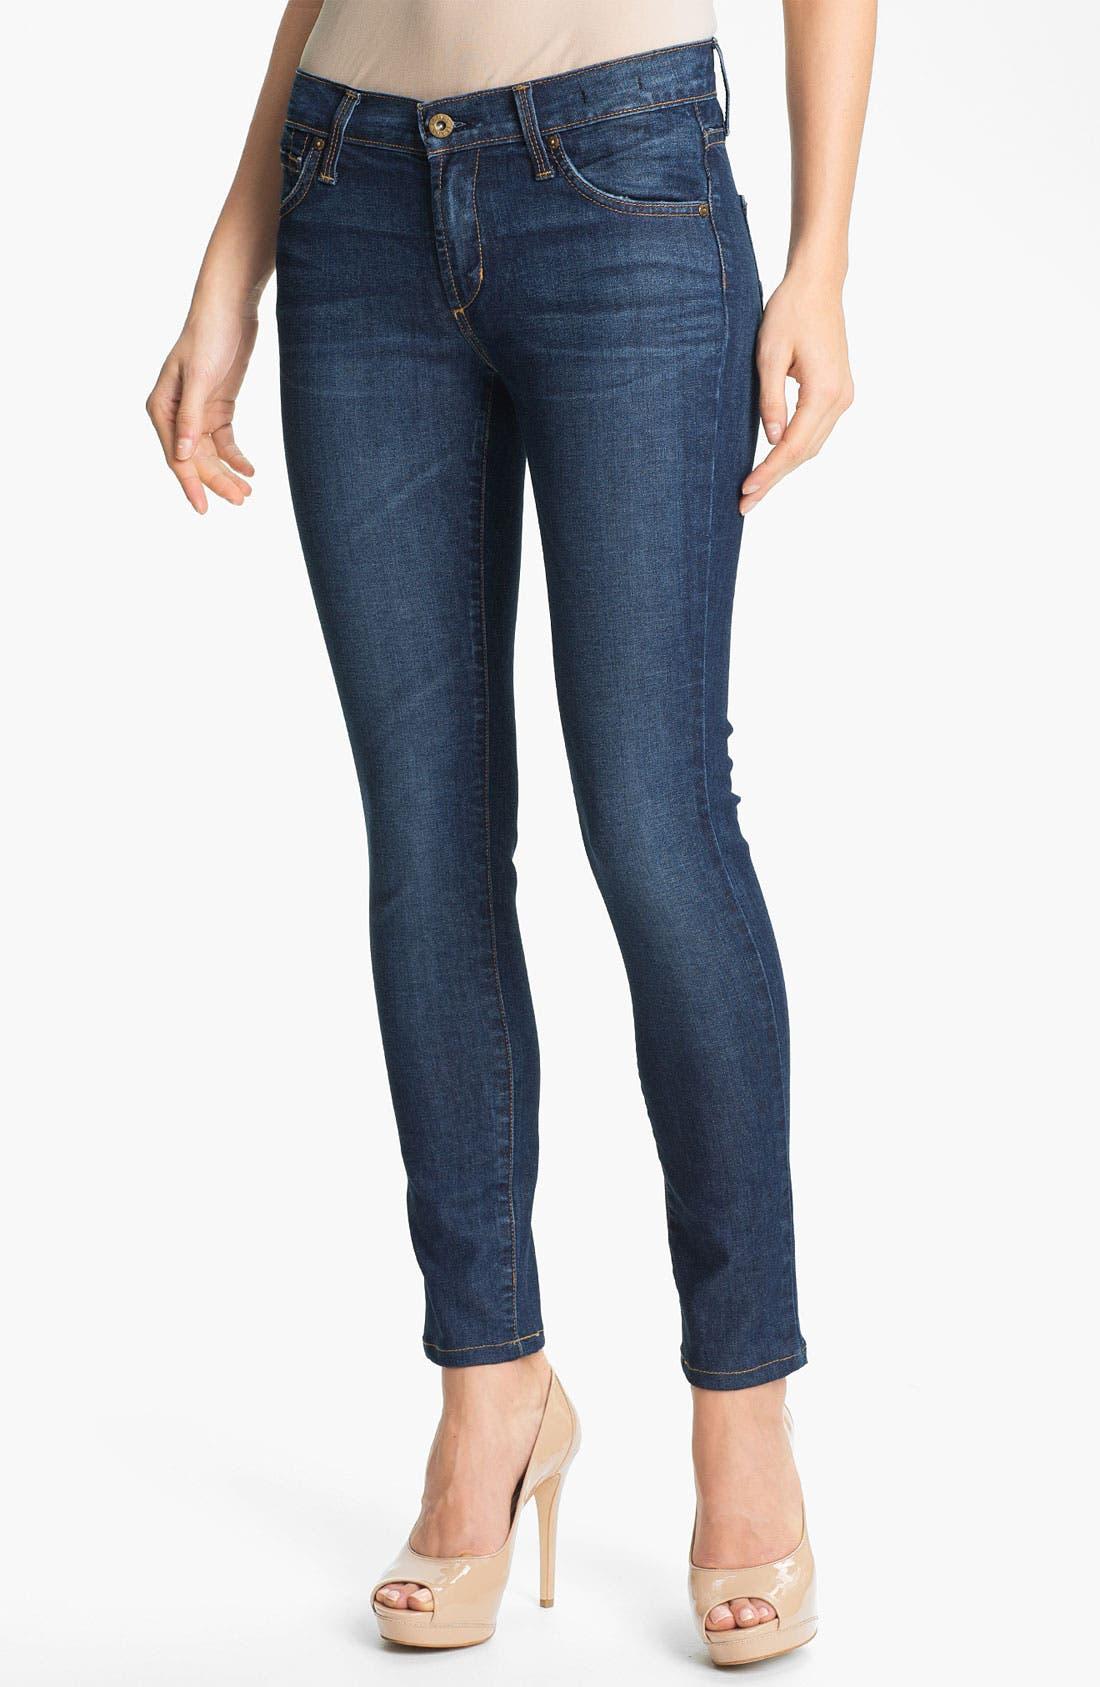 Alternate Image 1 Selected - James Jeans Skinny Stretch Jeans (Havana) (Petite) (Online Only)